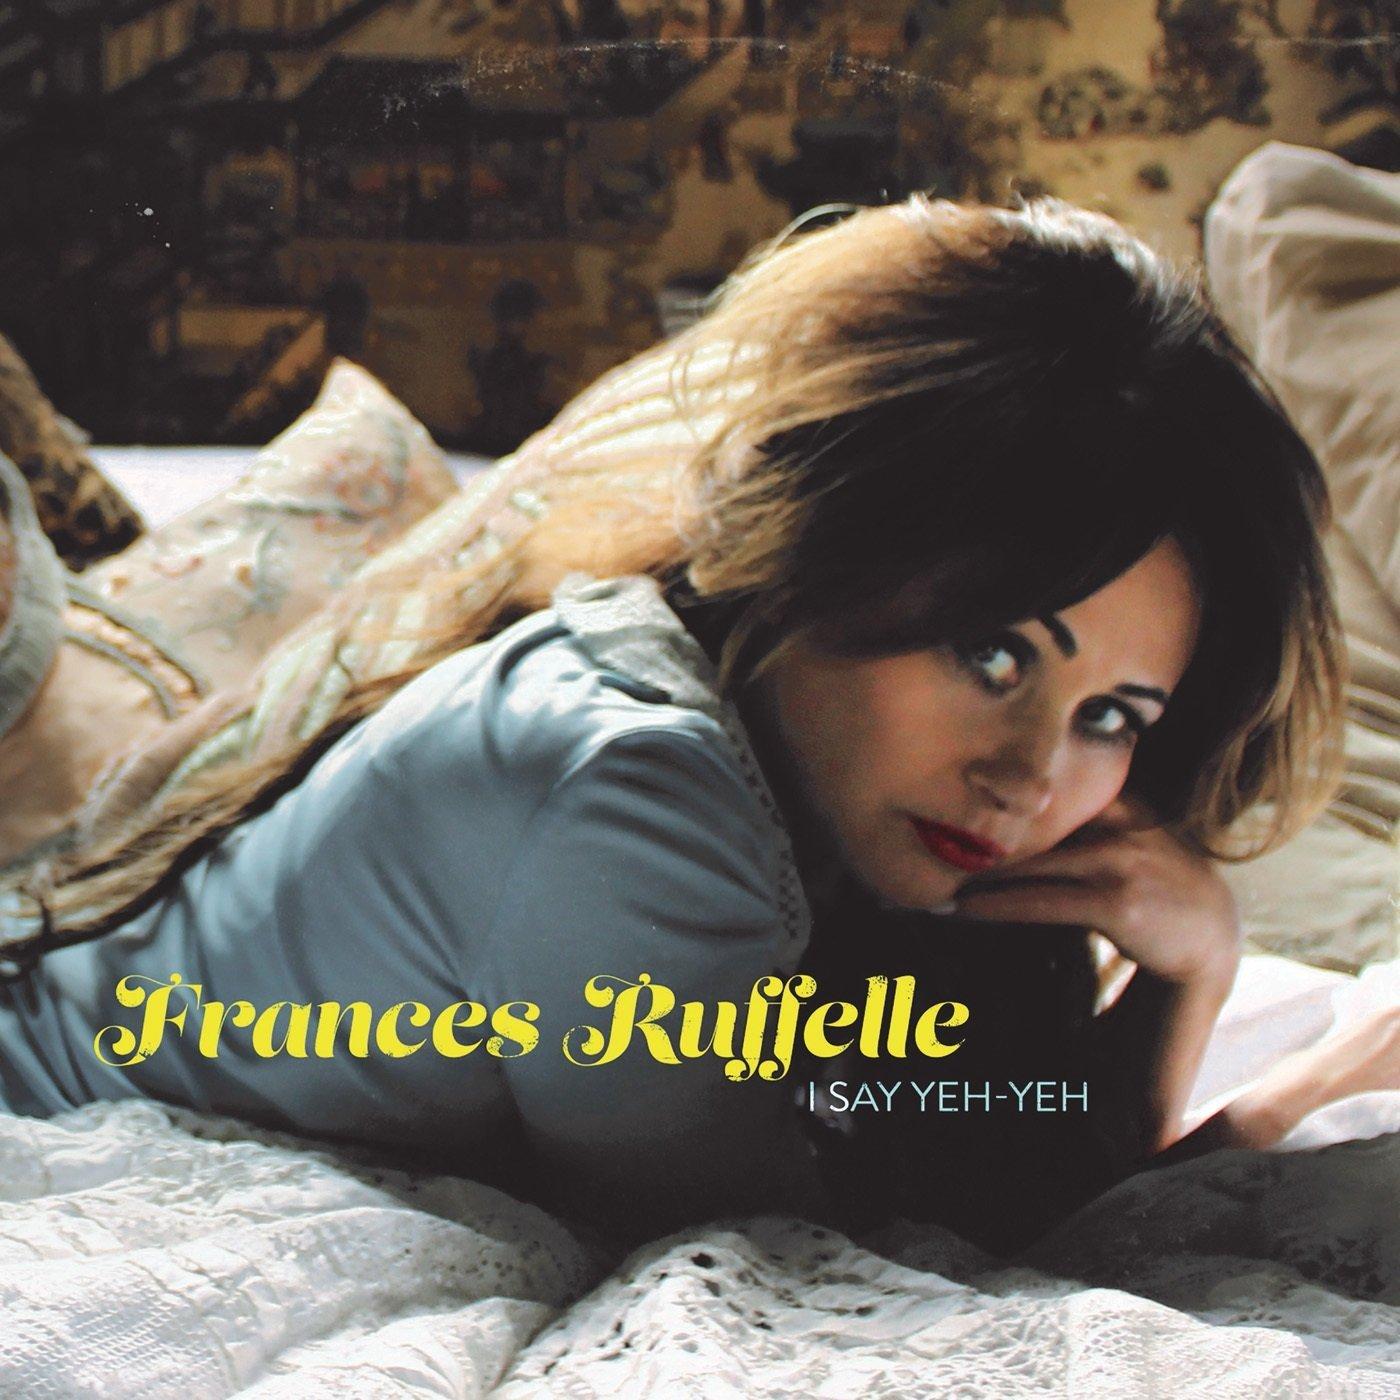 FRANCES RUFFELLE I Say Yeh-Yeh